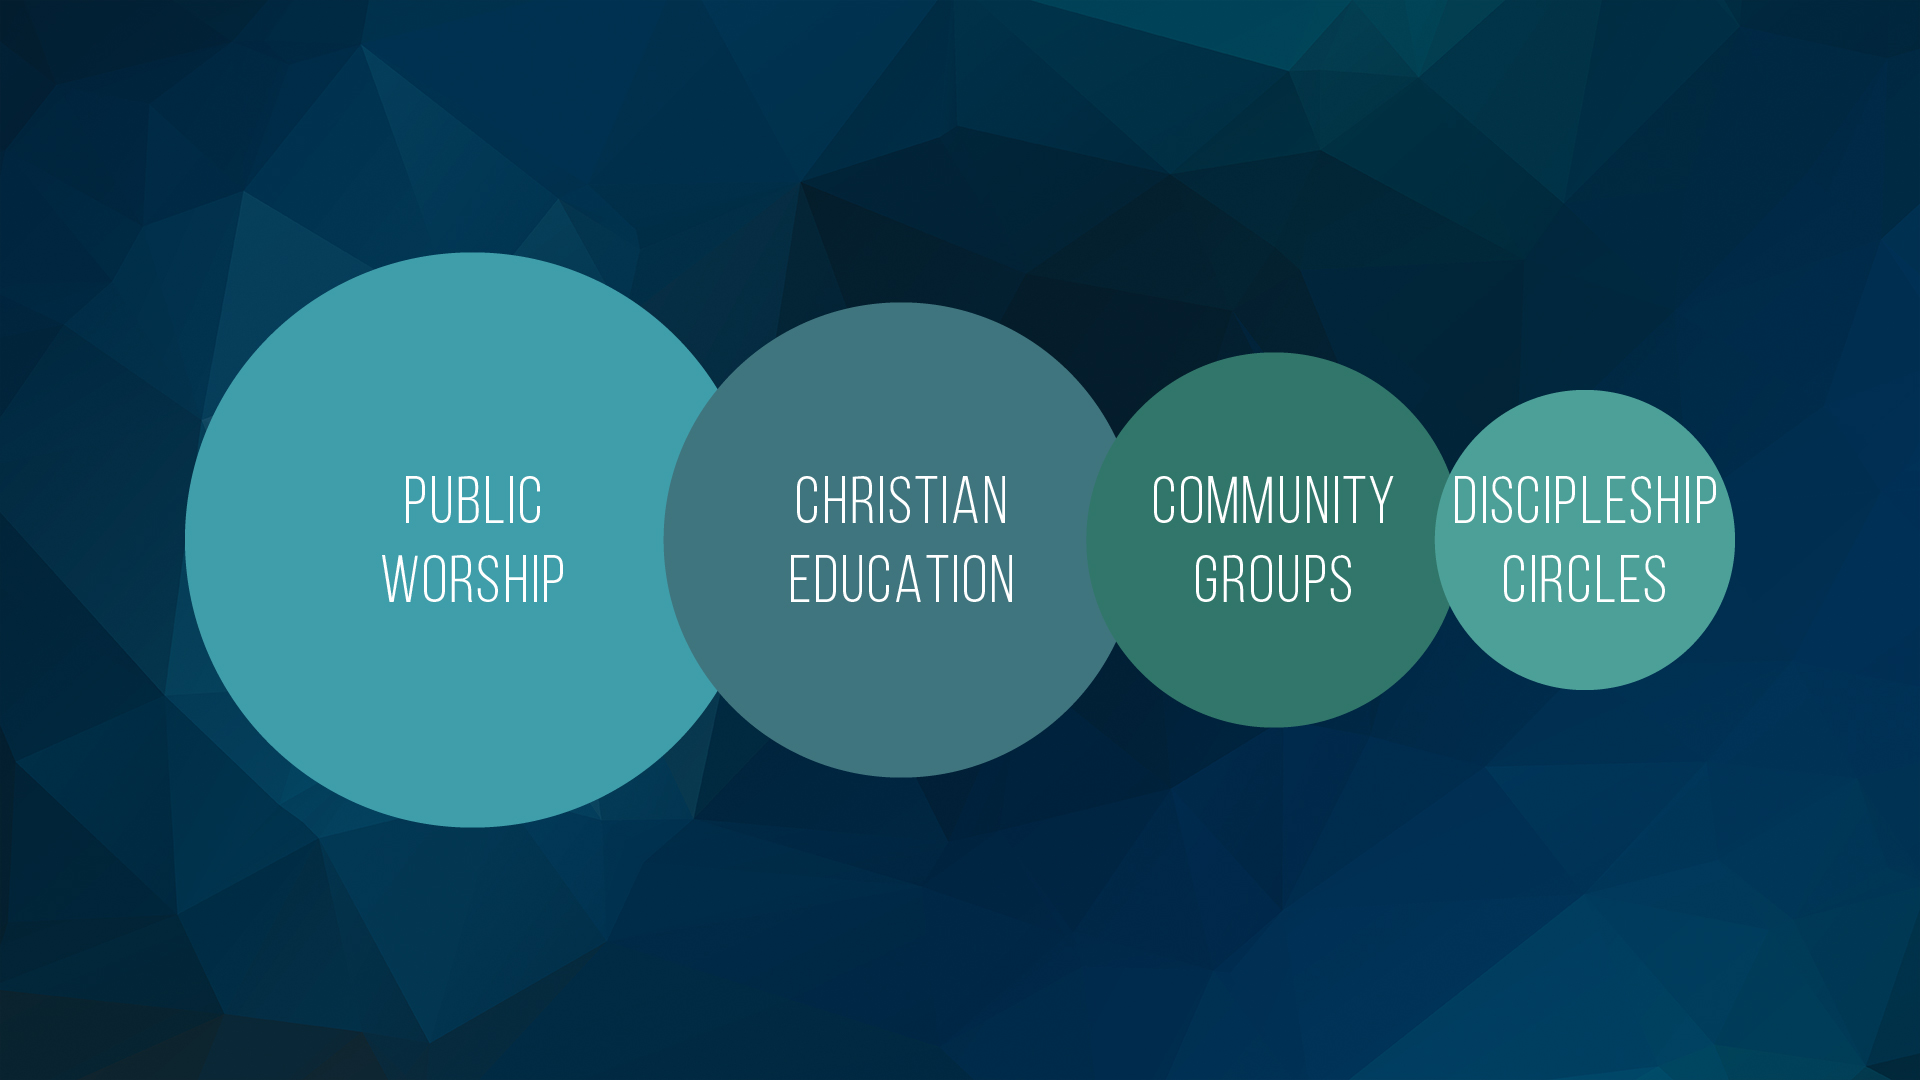 The Discipleship Pathway